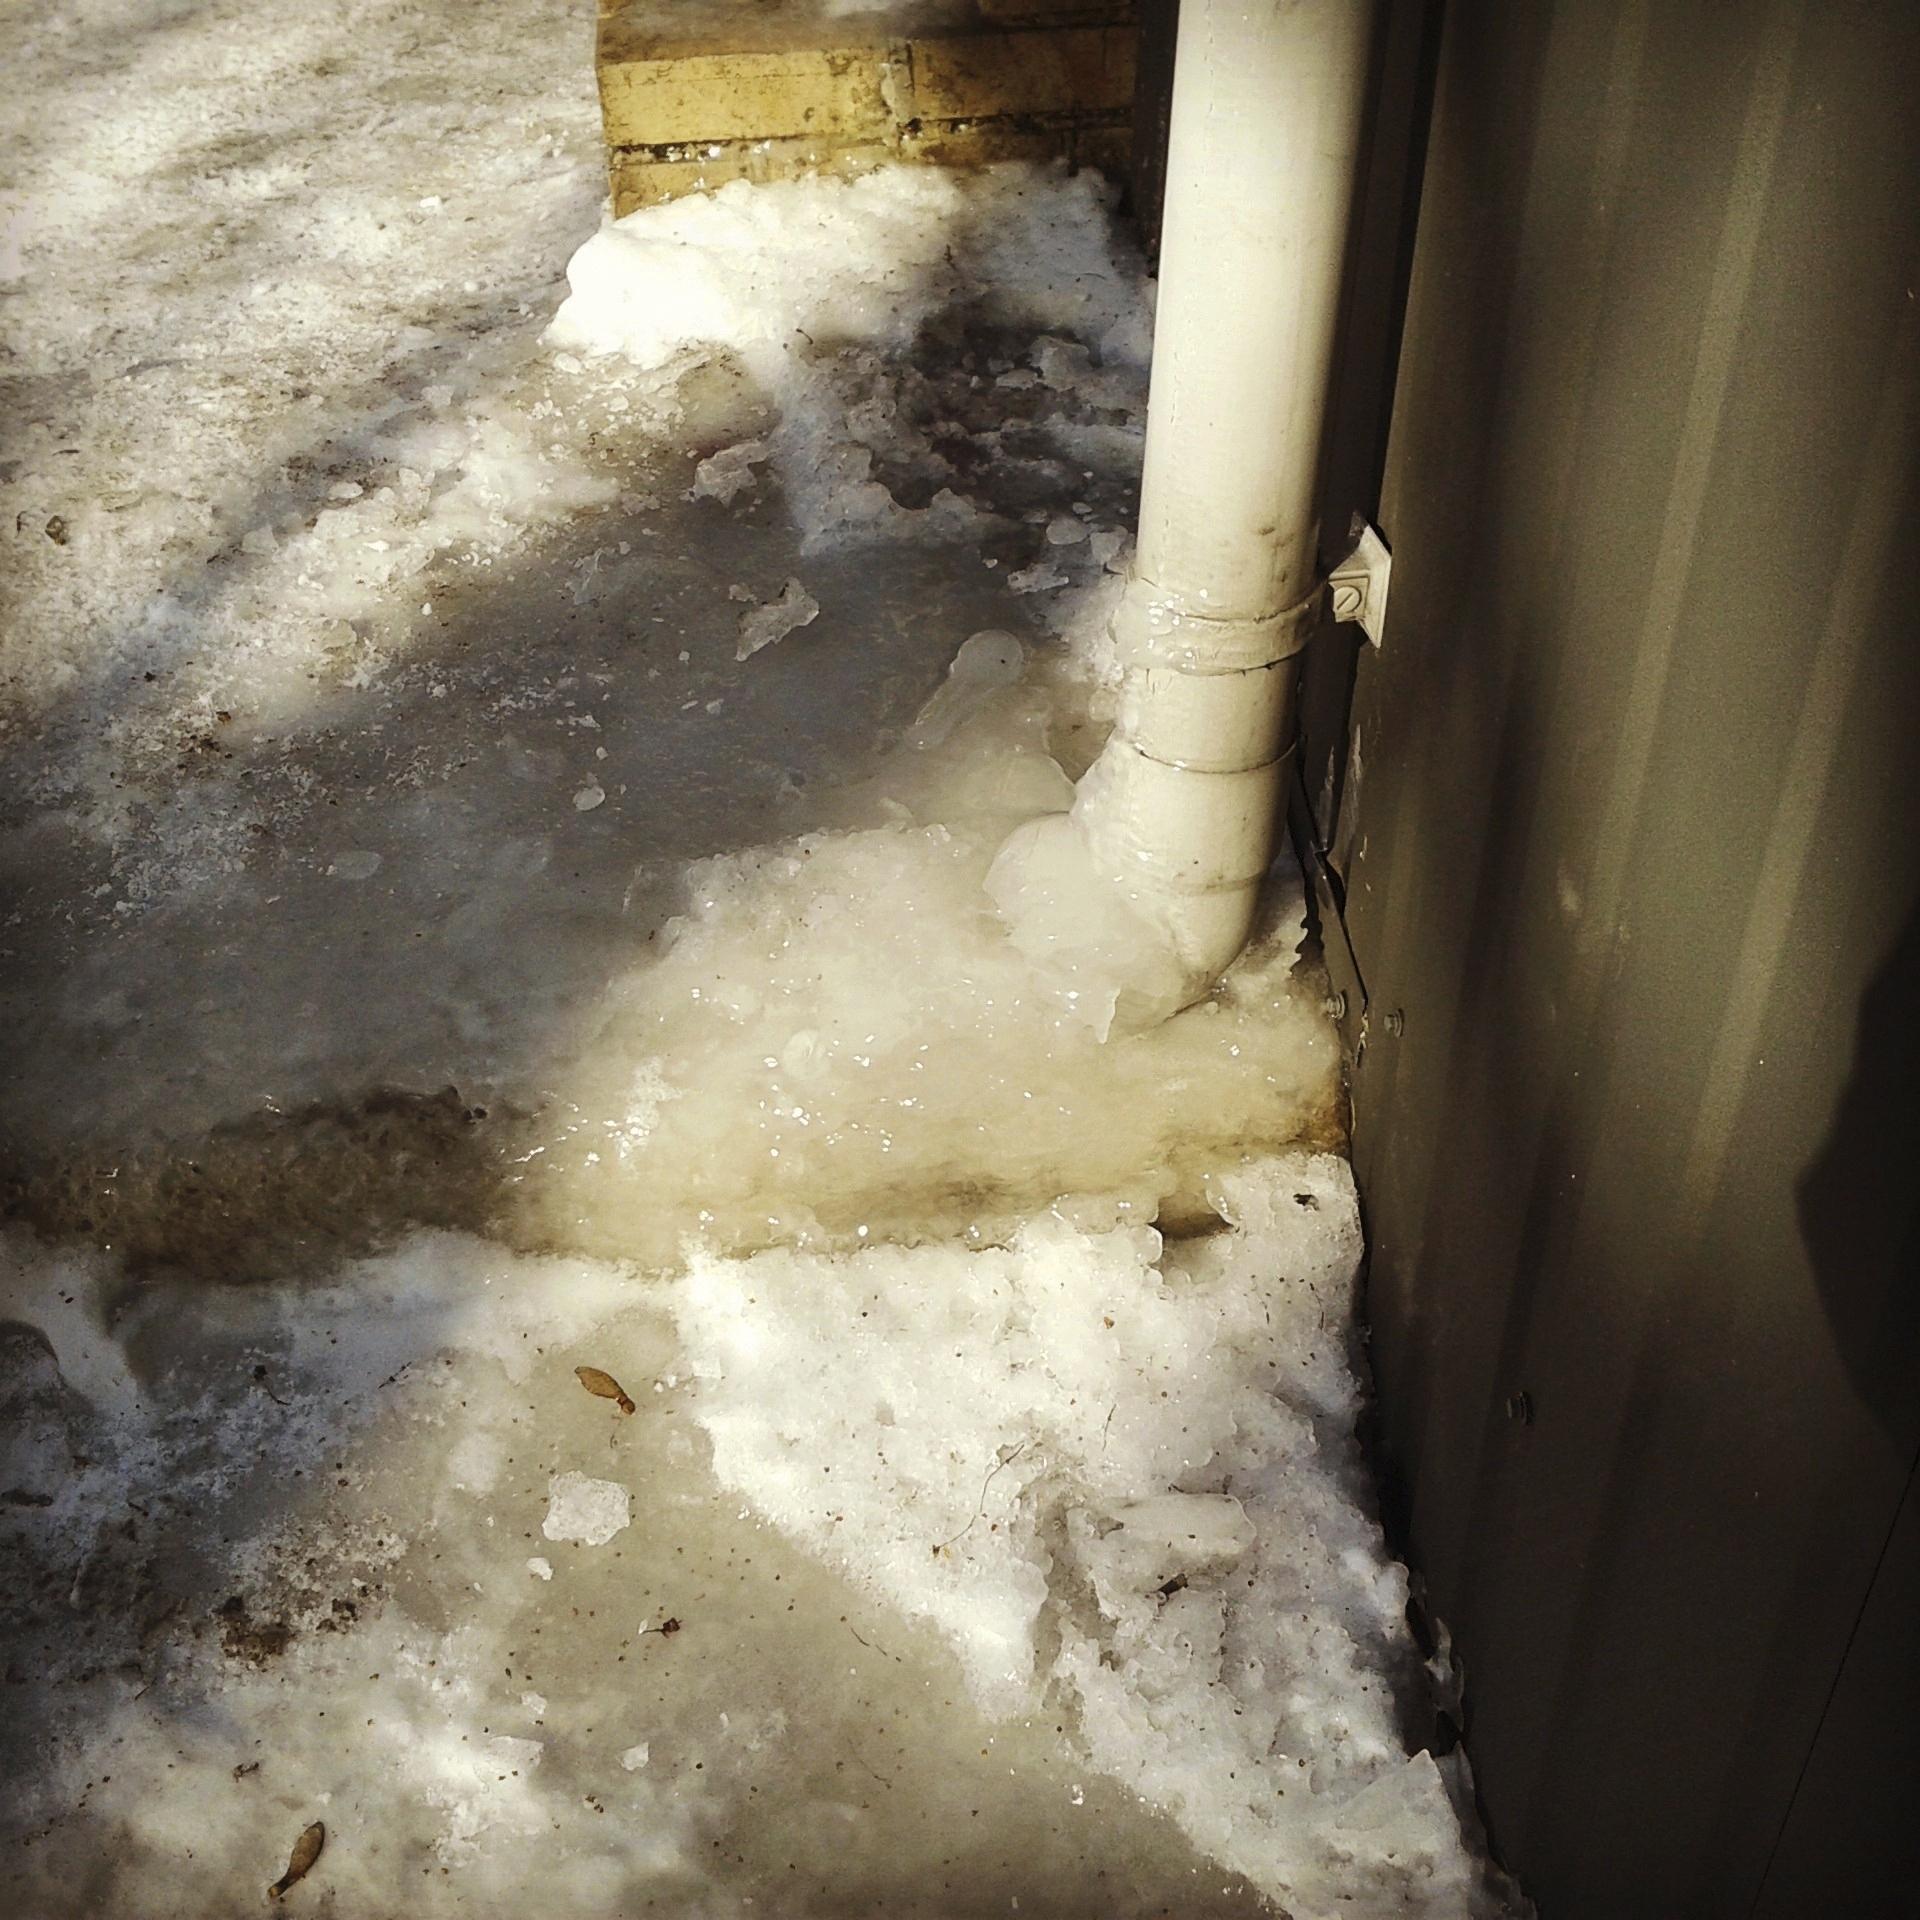 Installing Catch Basin For Floor Drain